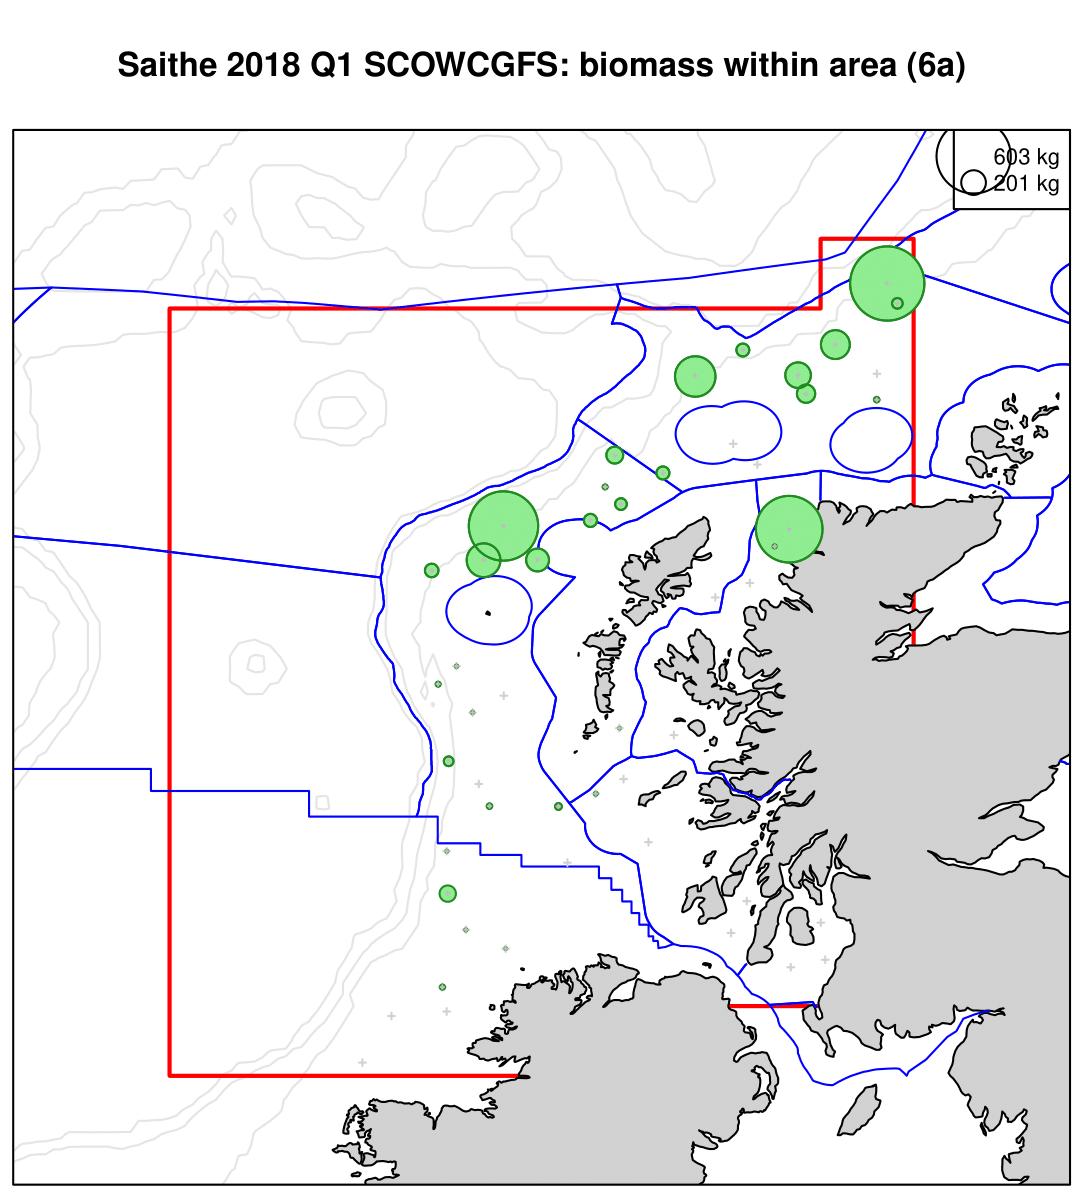 Saithe 2018 Q1 SCOWCGFS: biomass within area (6a)